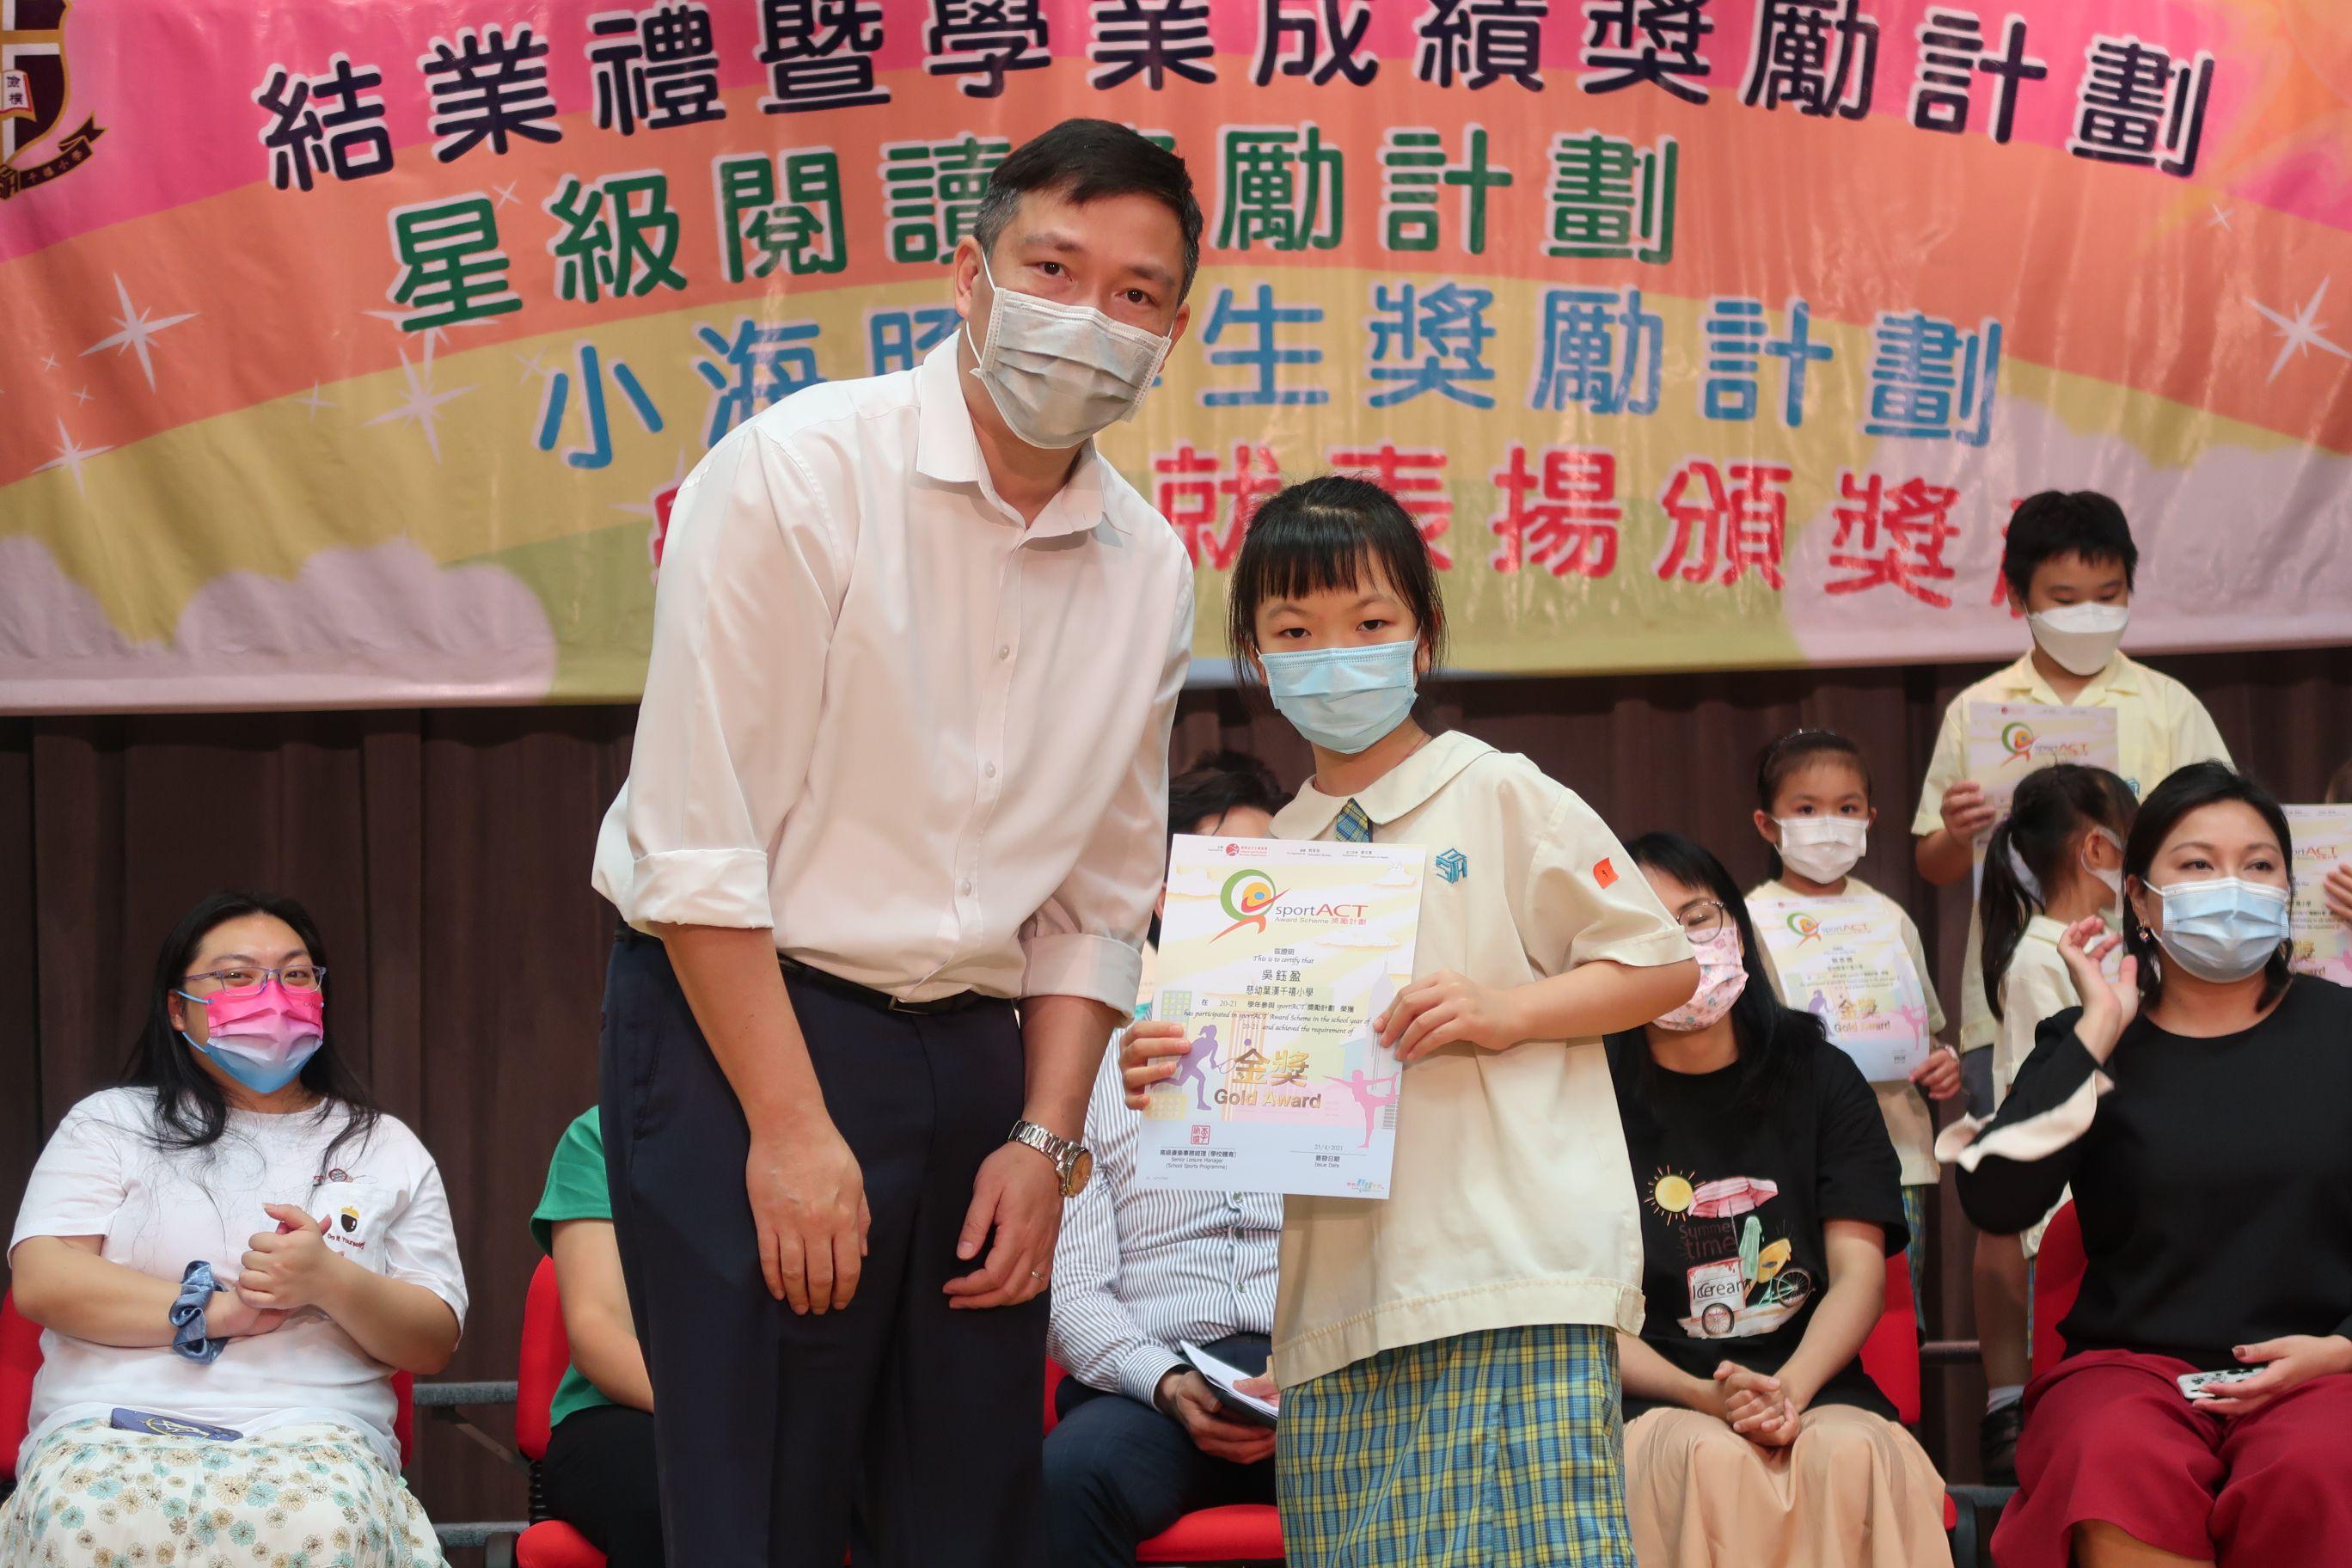 https://syh.edu.hk/sites/default/files/img_5902.jpg